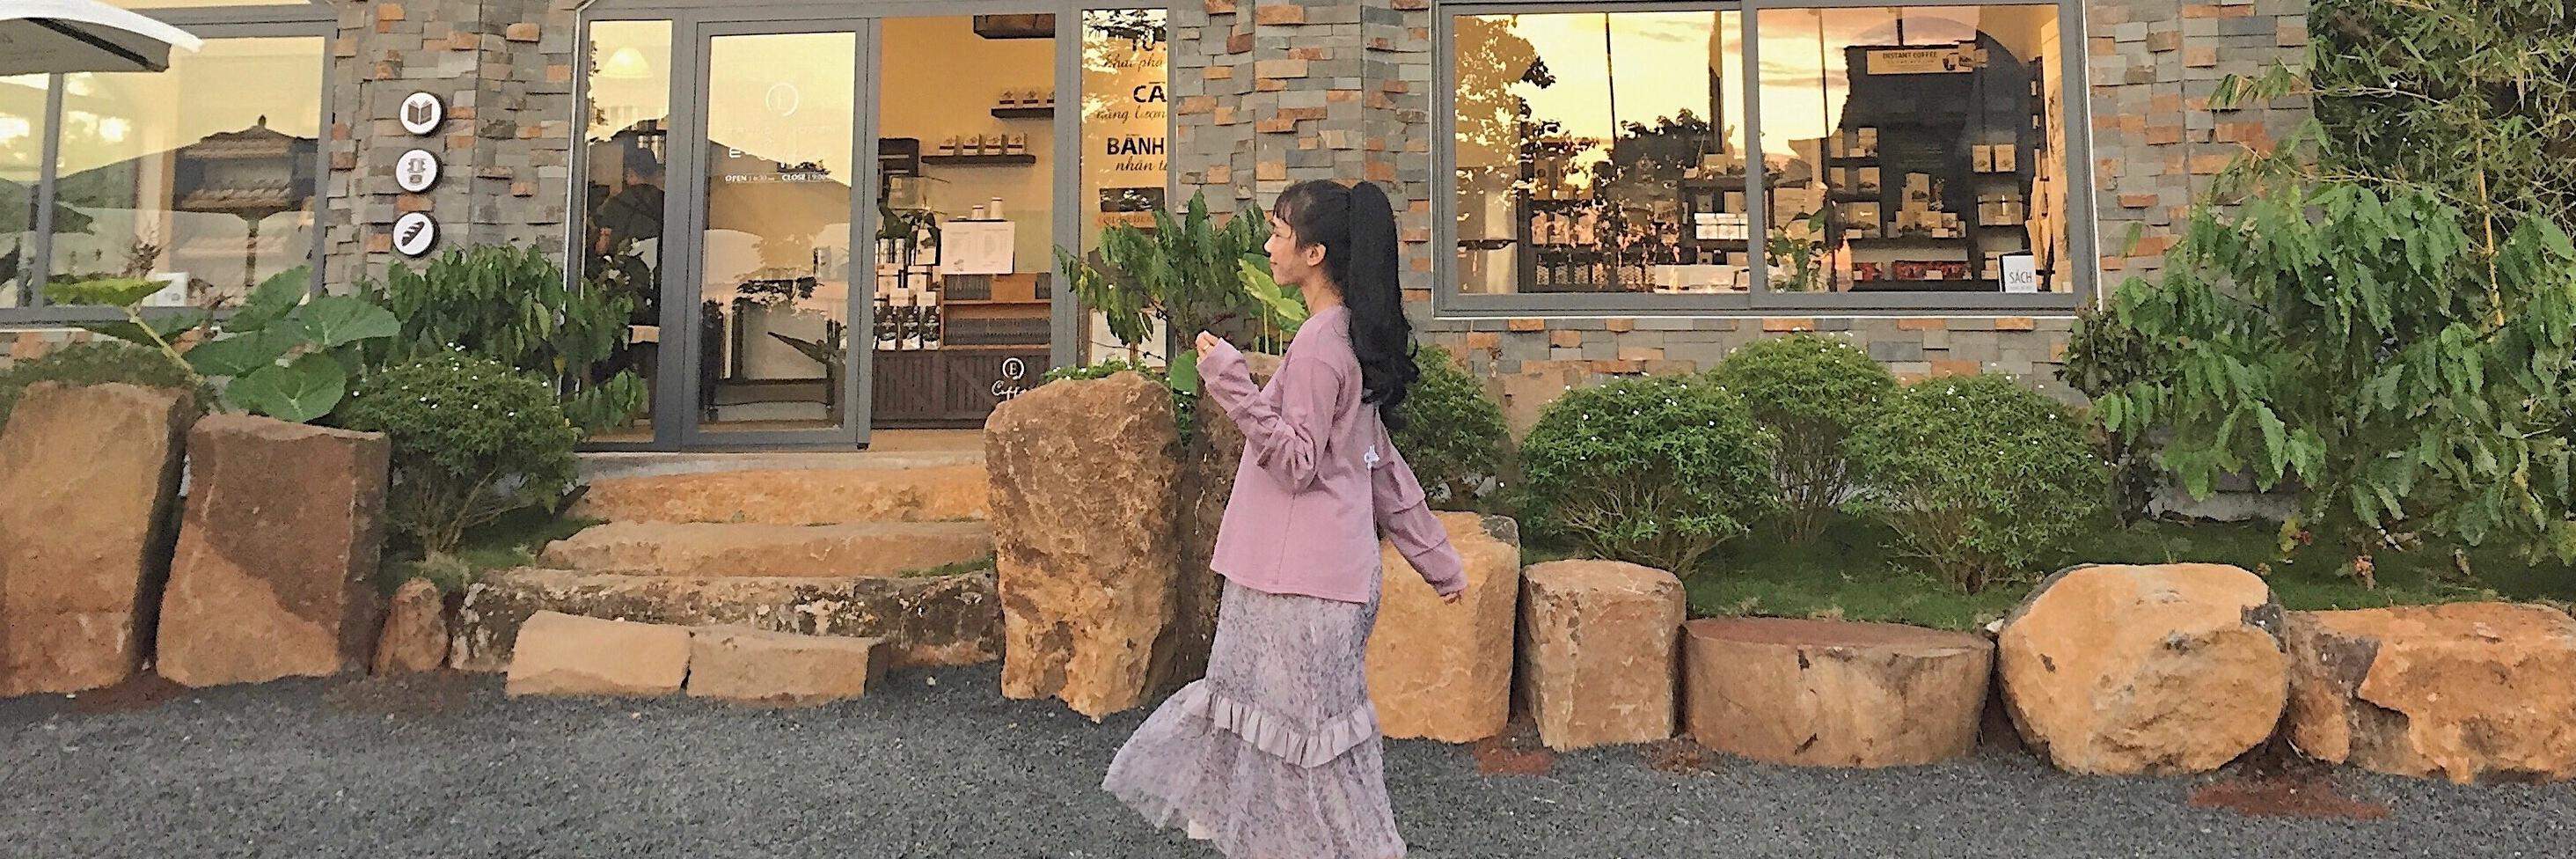 https://gody.vn/blog/yumi.uyenthuong06063858/post/bao-tang-the-gio-ca-phe-buon-ma-thuot-5847